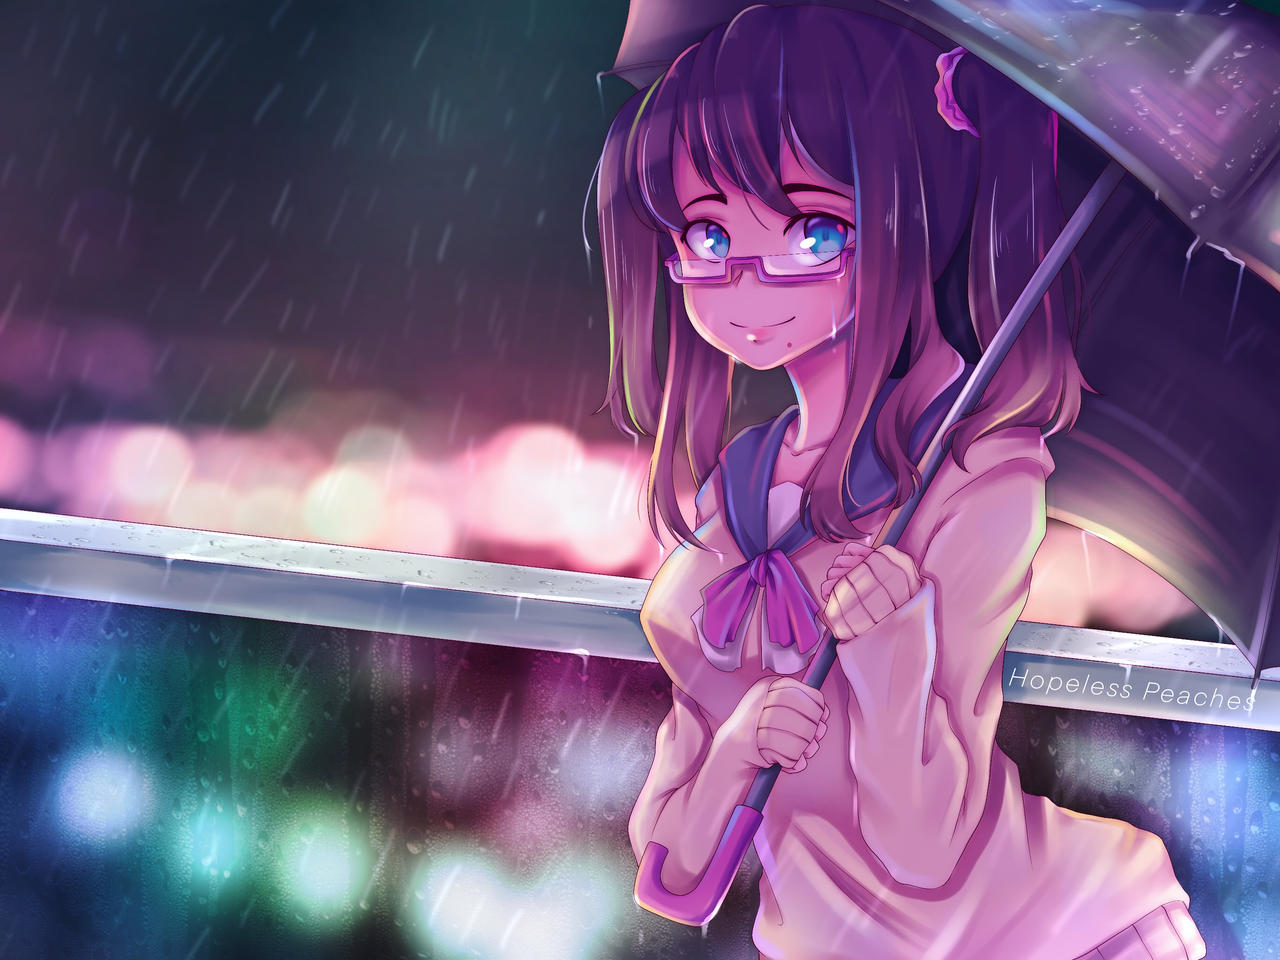 Anime Girl in the Rain | Manga on Procreate